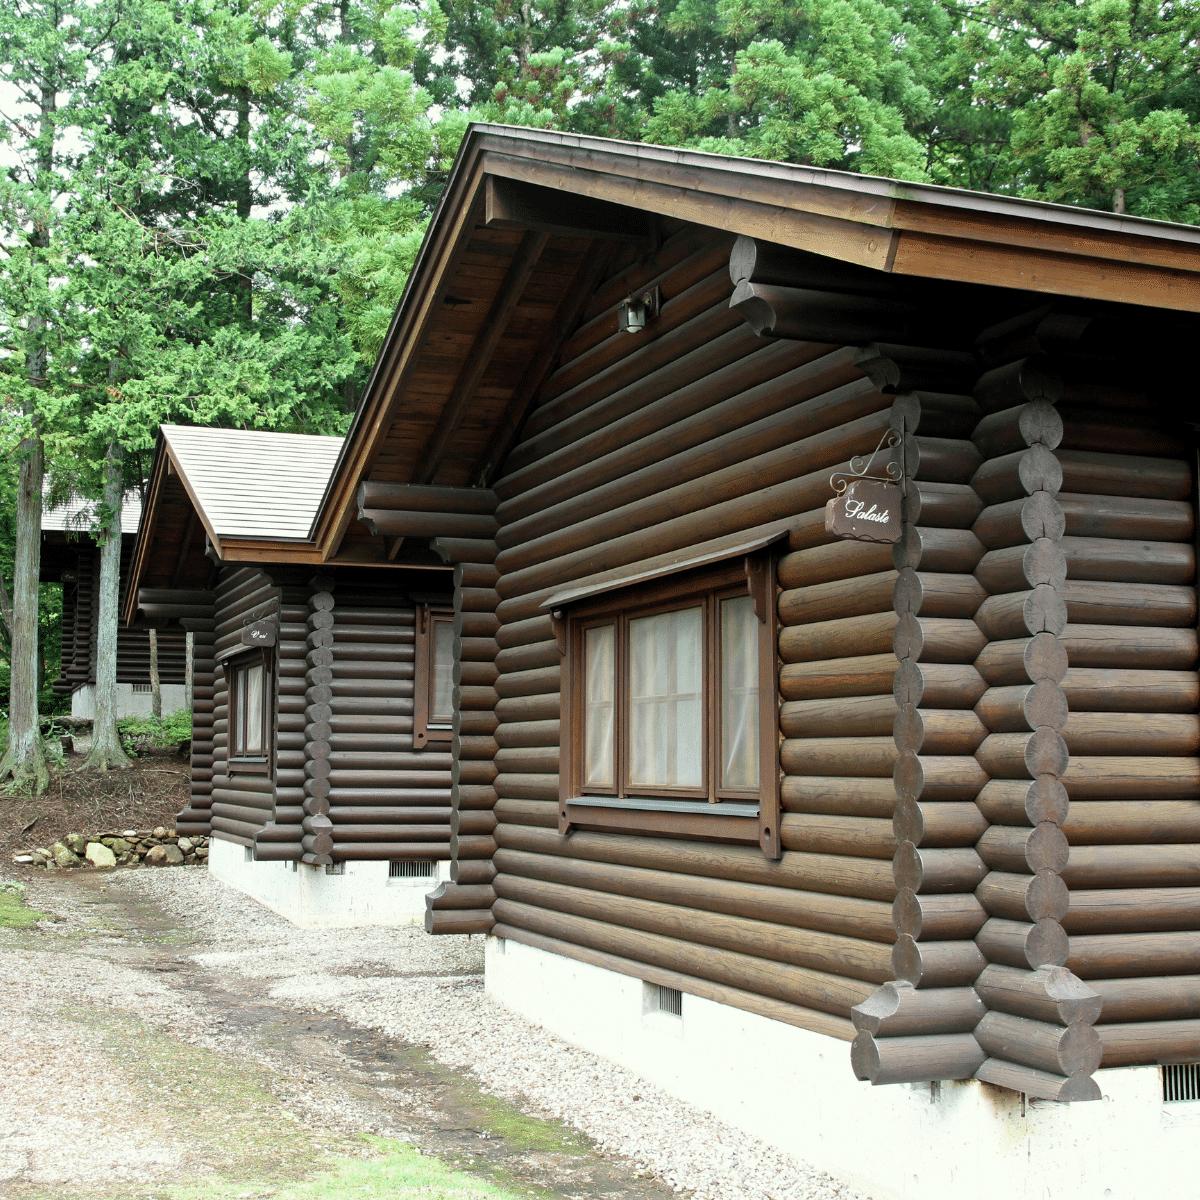 side image of similar looking log homes